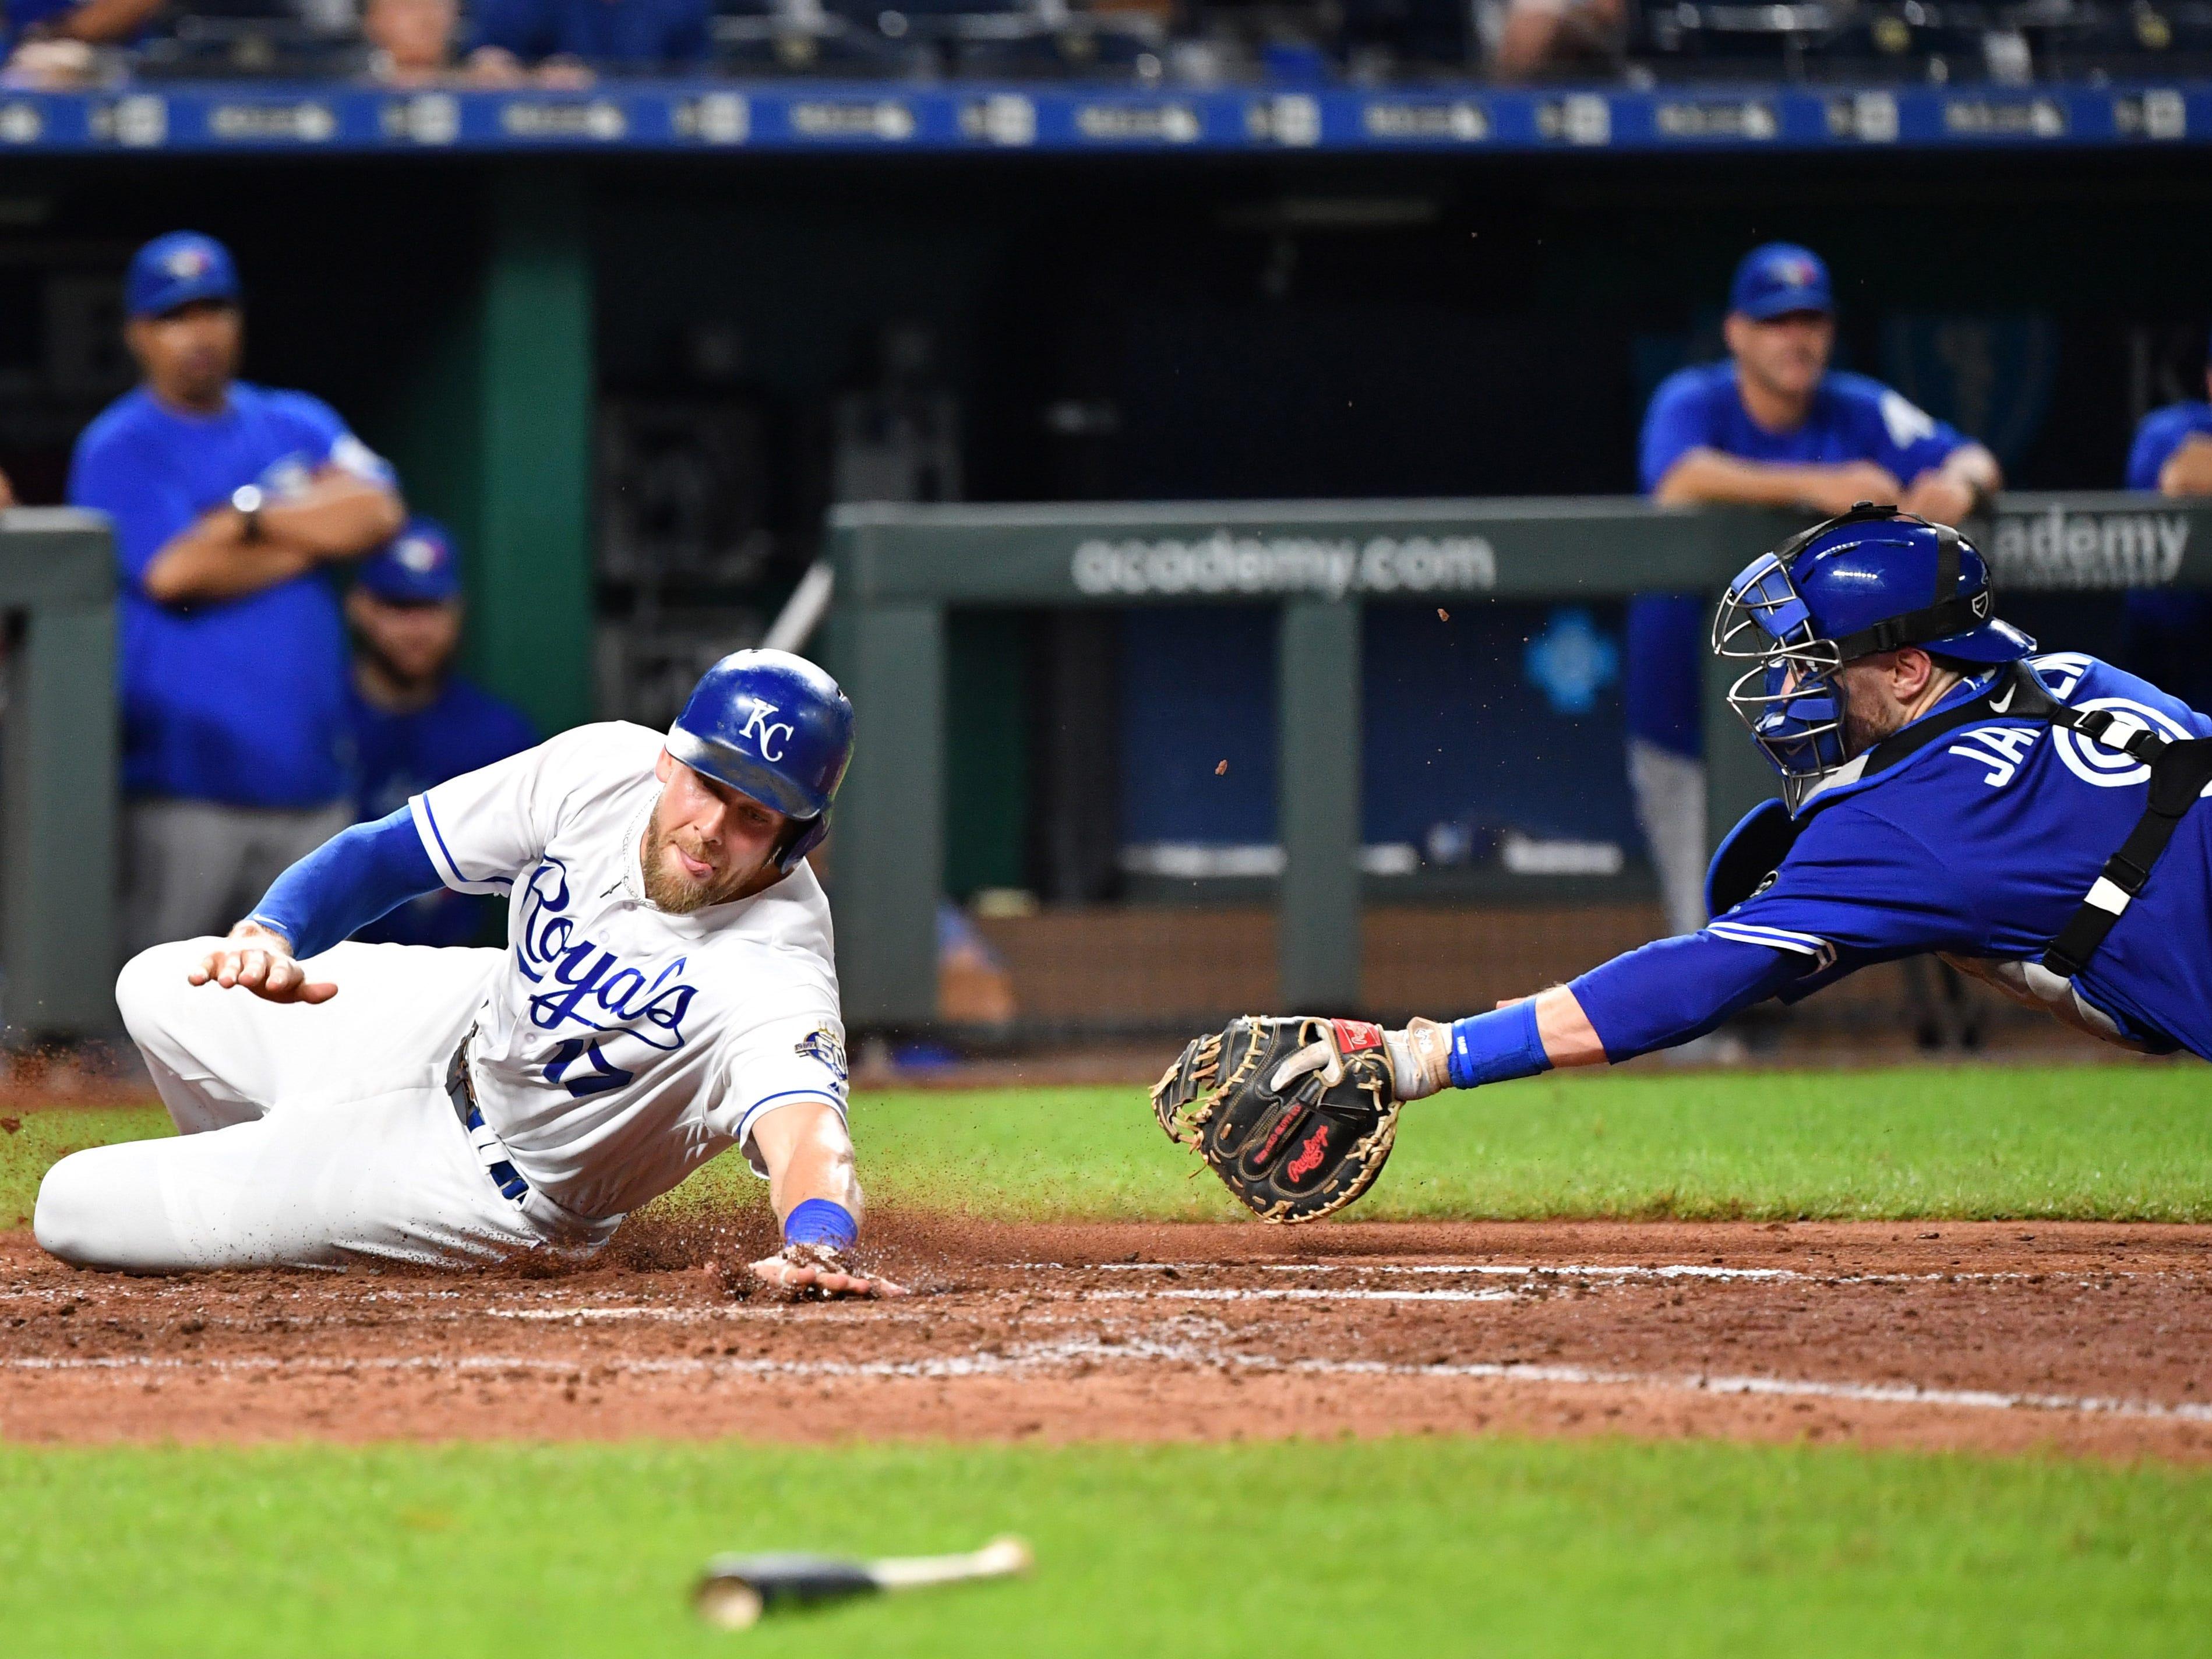 Aug 16, 2018; Kansas City, MO, USA; during the sixth inning against the Toronto Blue Jays at Kauffman Stadium. Mandatory Credit: Peter G. Aiken/USA TODAY Sports